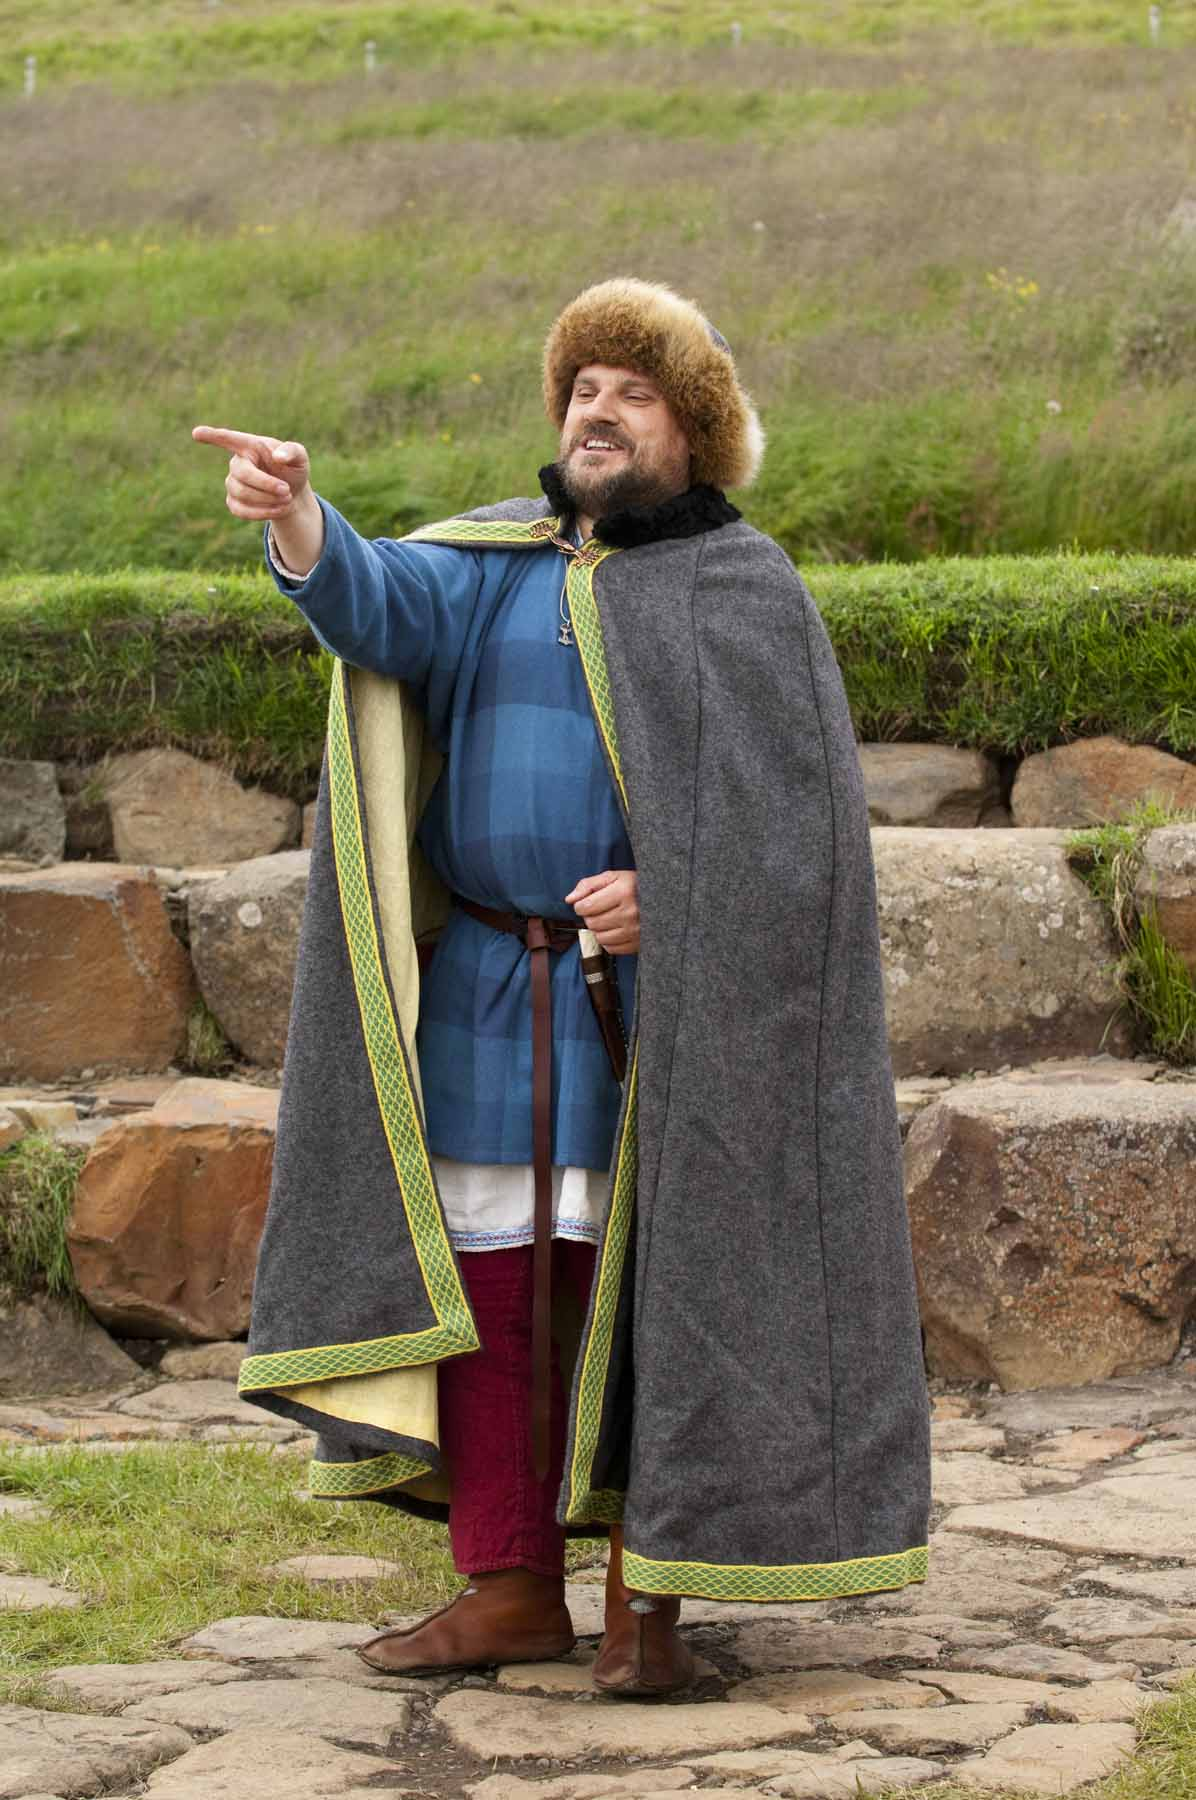 Native Orcadian storyteller Tom Muir, wearing his Viking garb made for him in Storholmen Viking Village, Sweden.